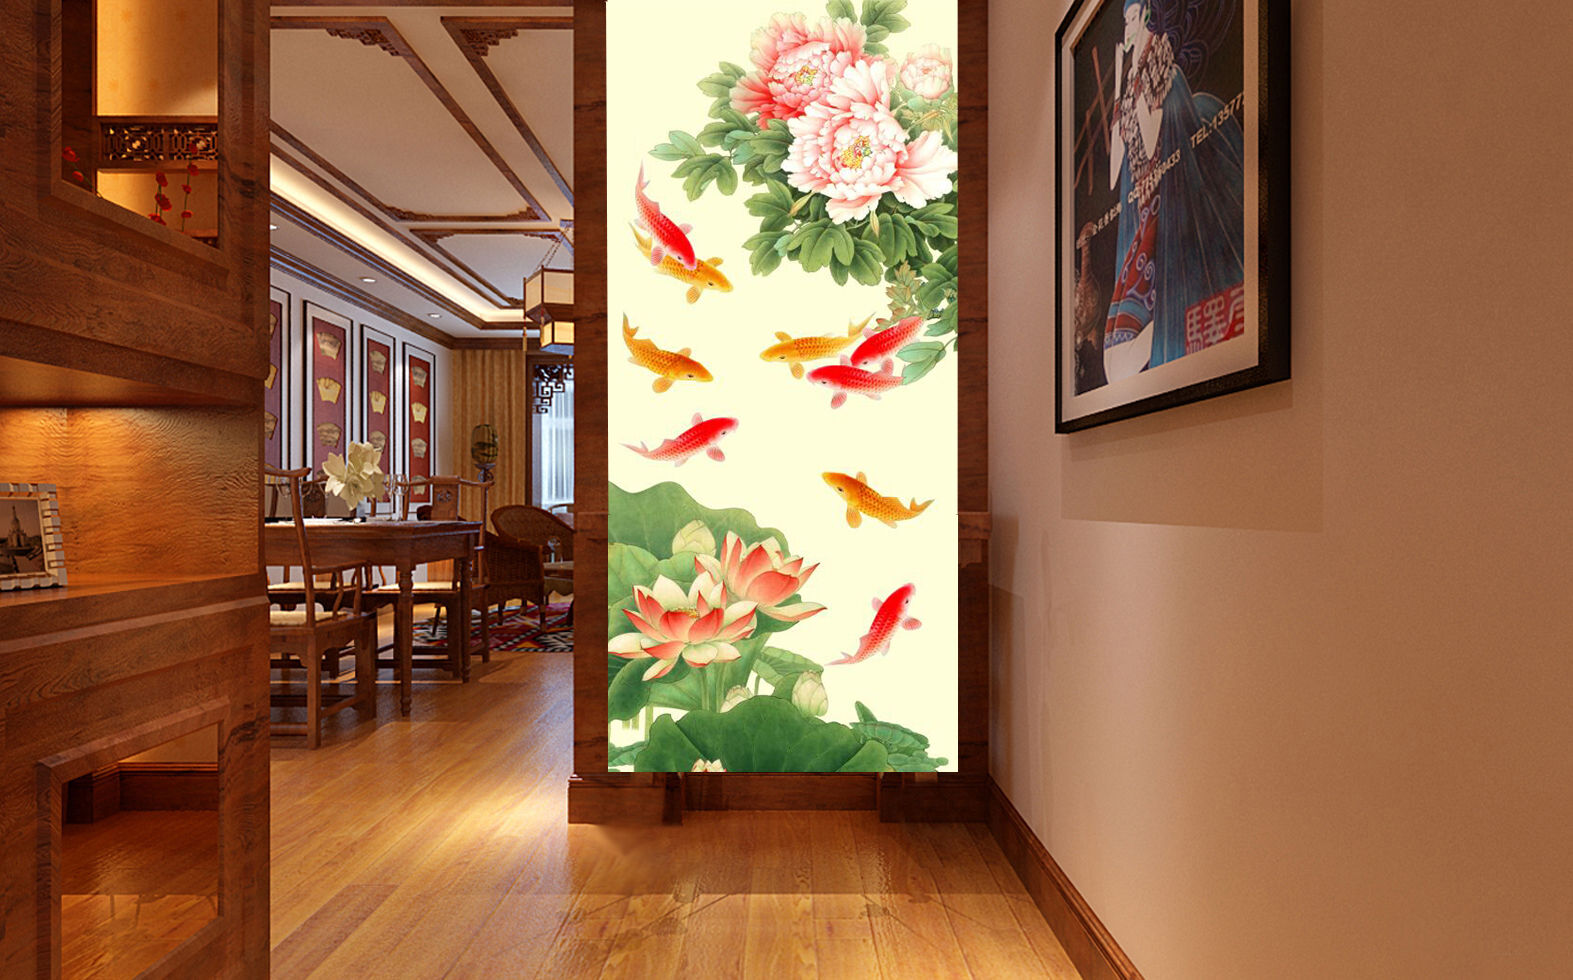 3D Fische, Lotus 66 Fototapeten Wandbild Fototapete Bild Tapete Familie Kinder